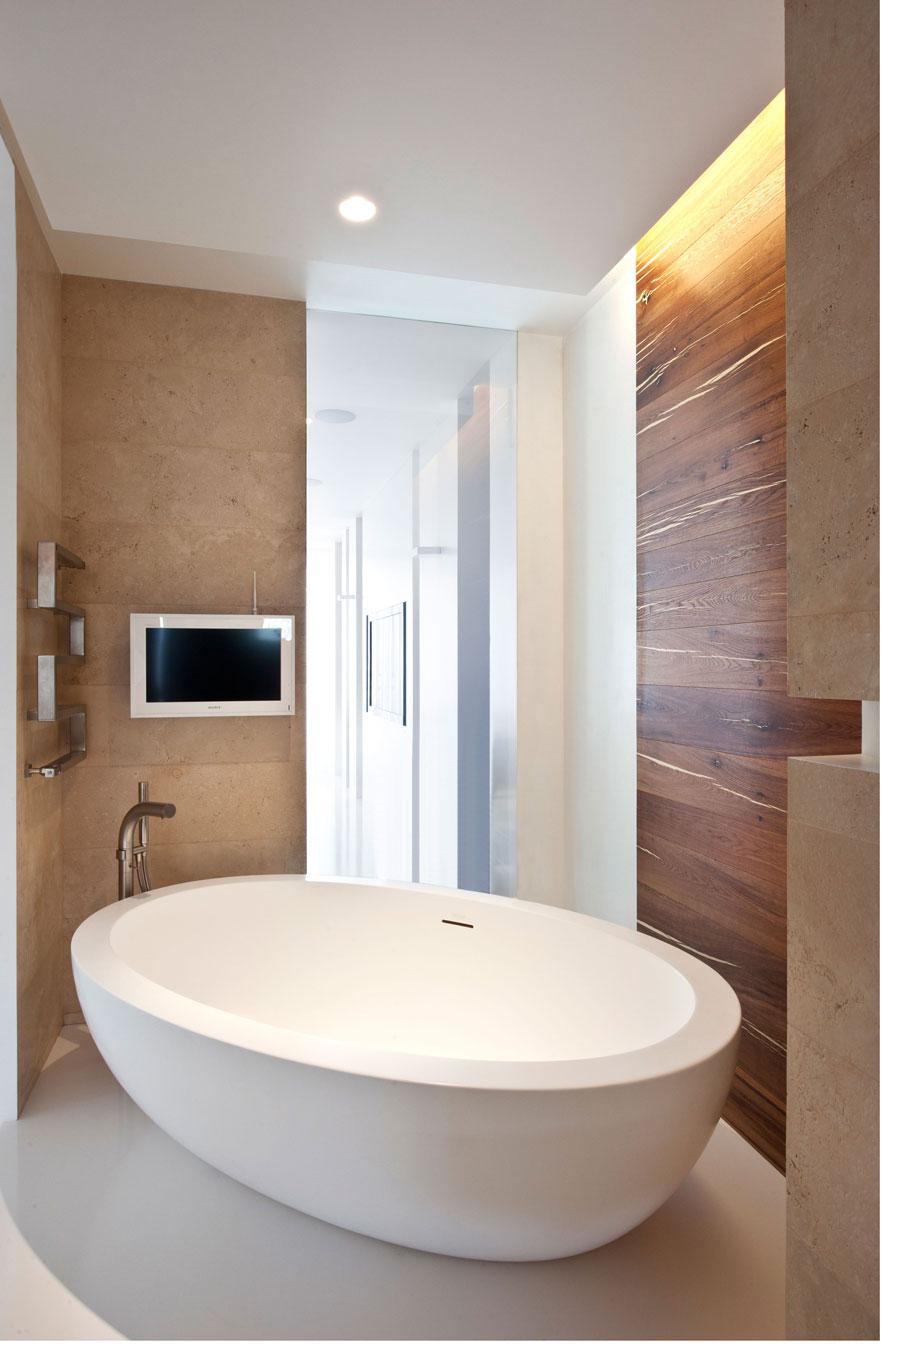 Freestanding modern bath tub | Interior Design Ideas